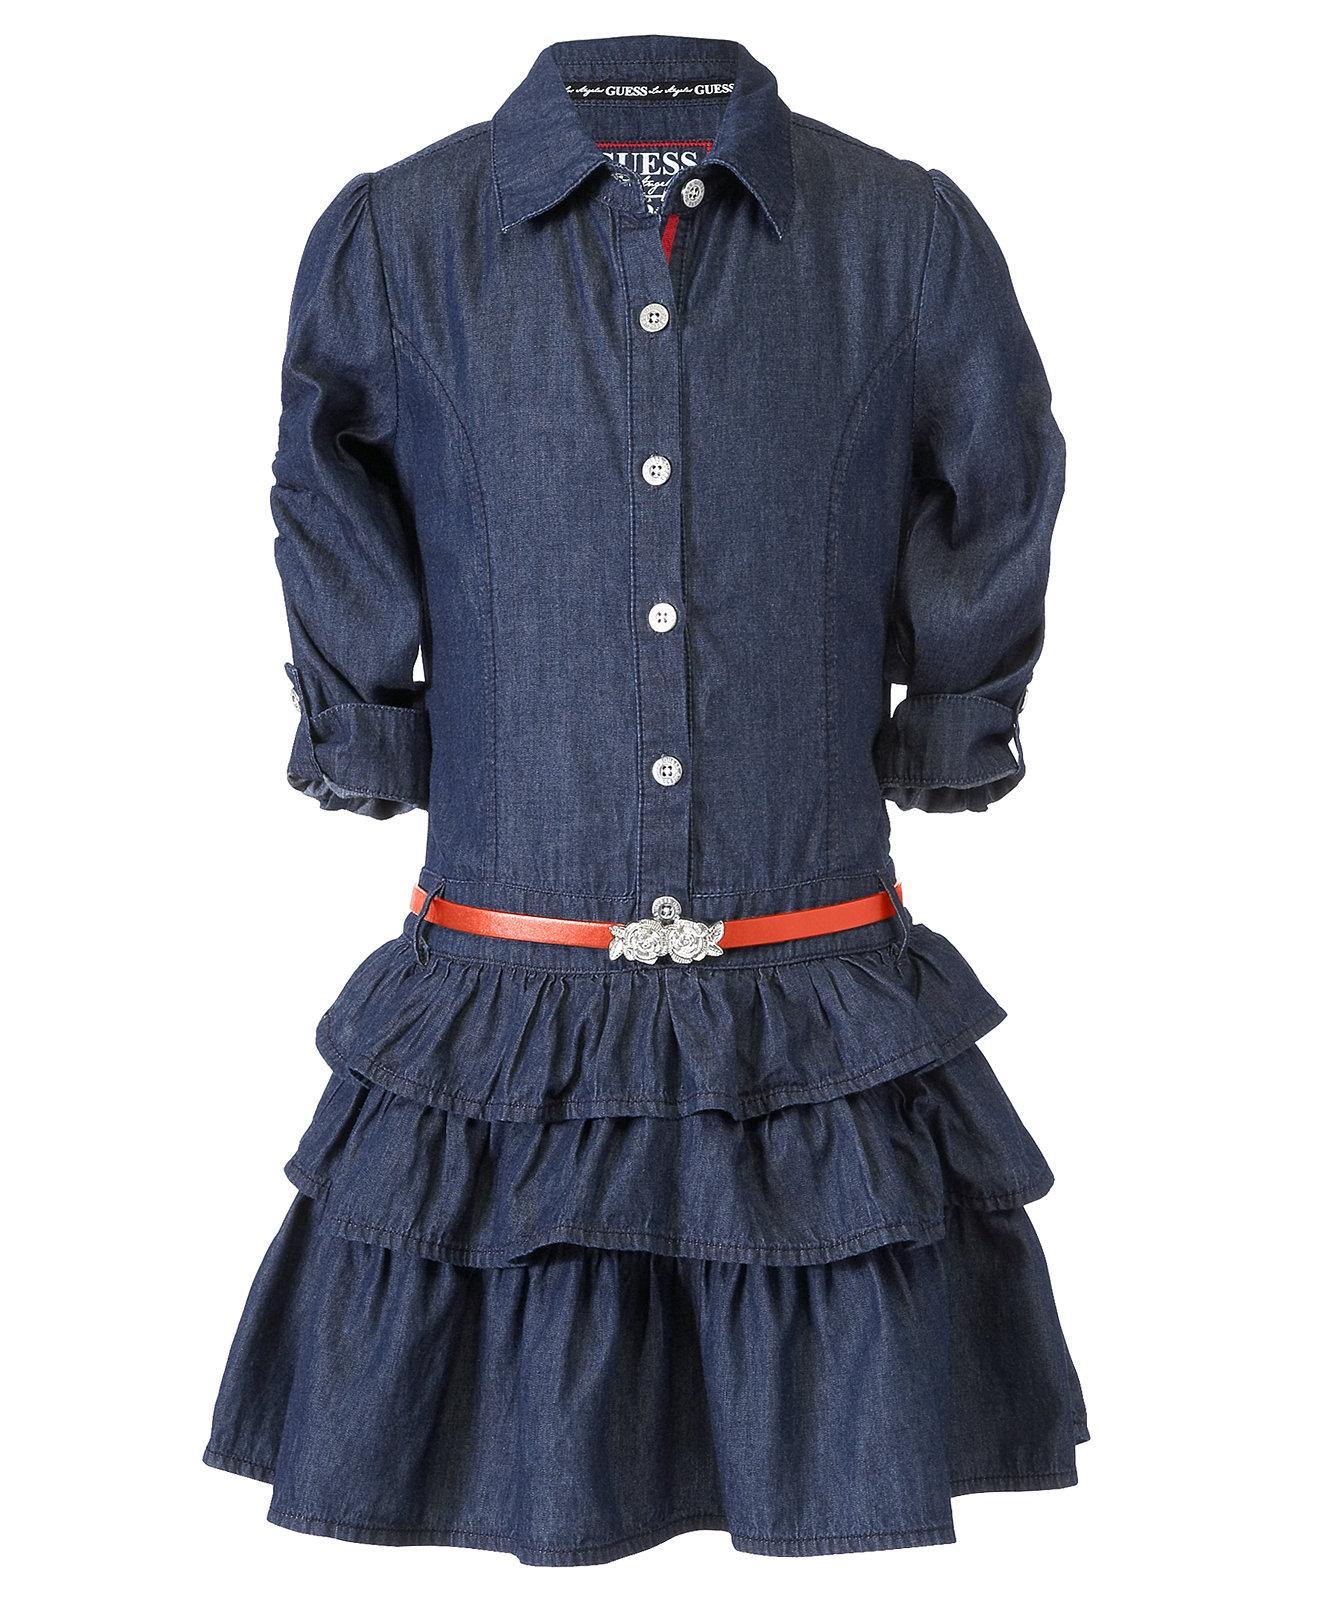 Bonnie Jean Holiday Dresses